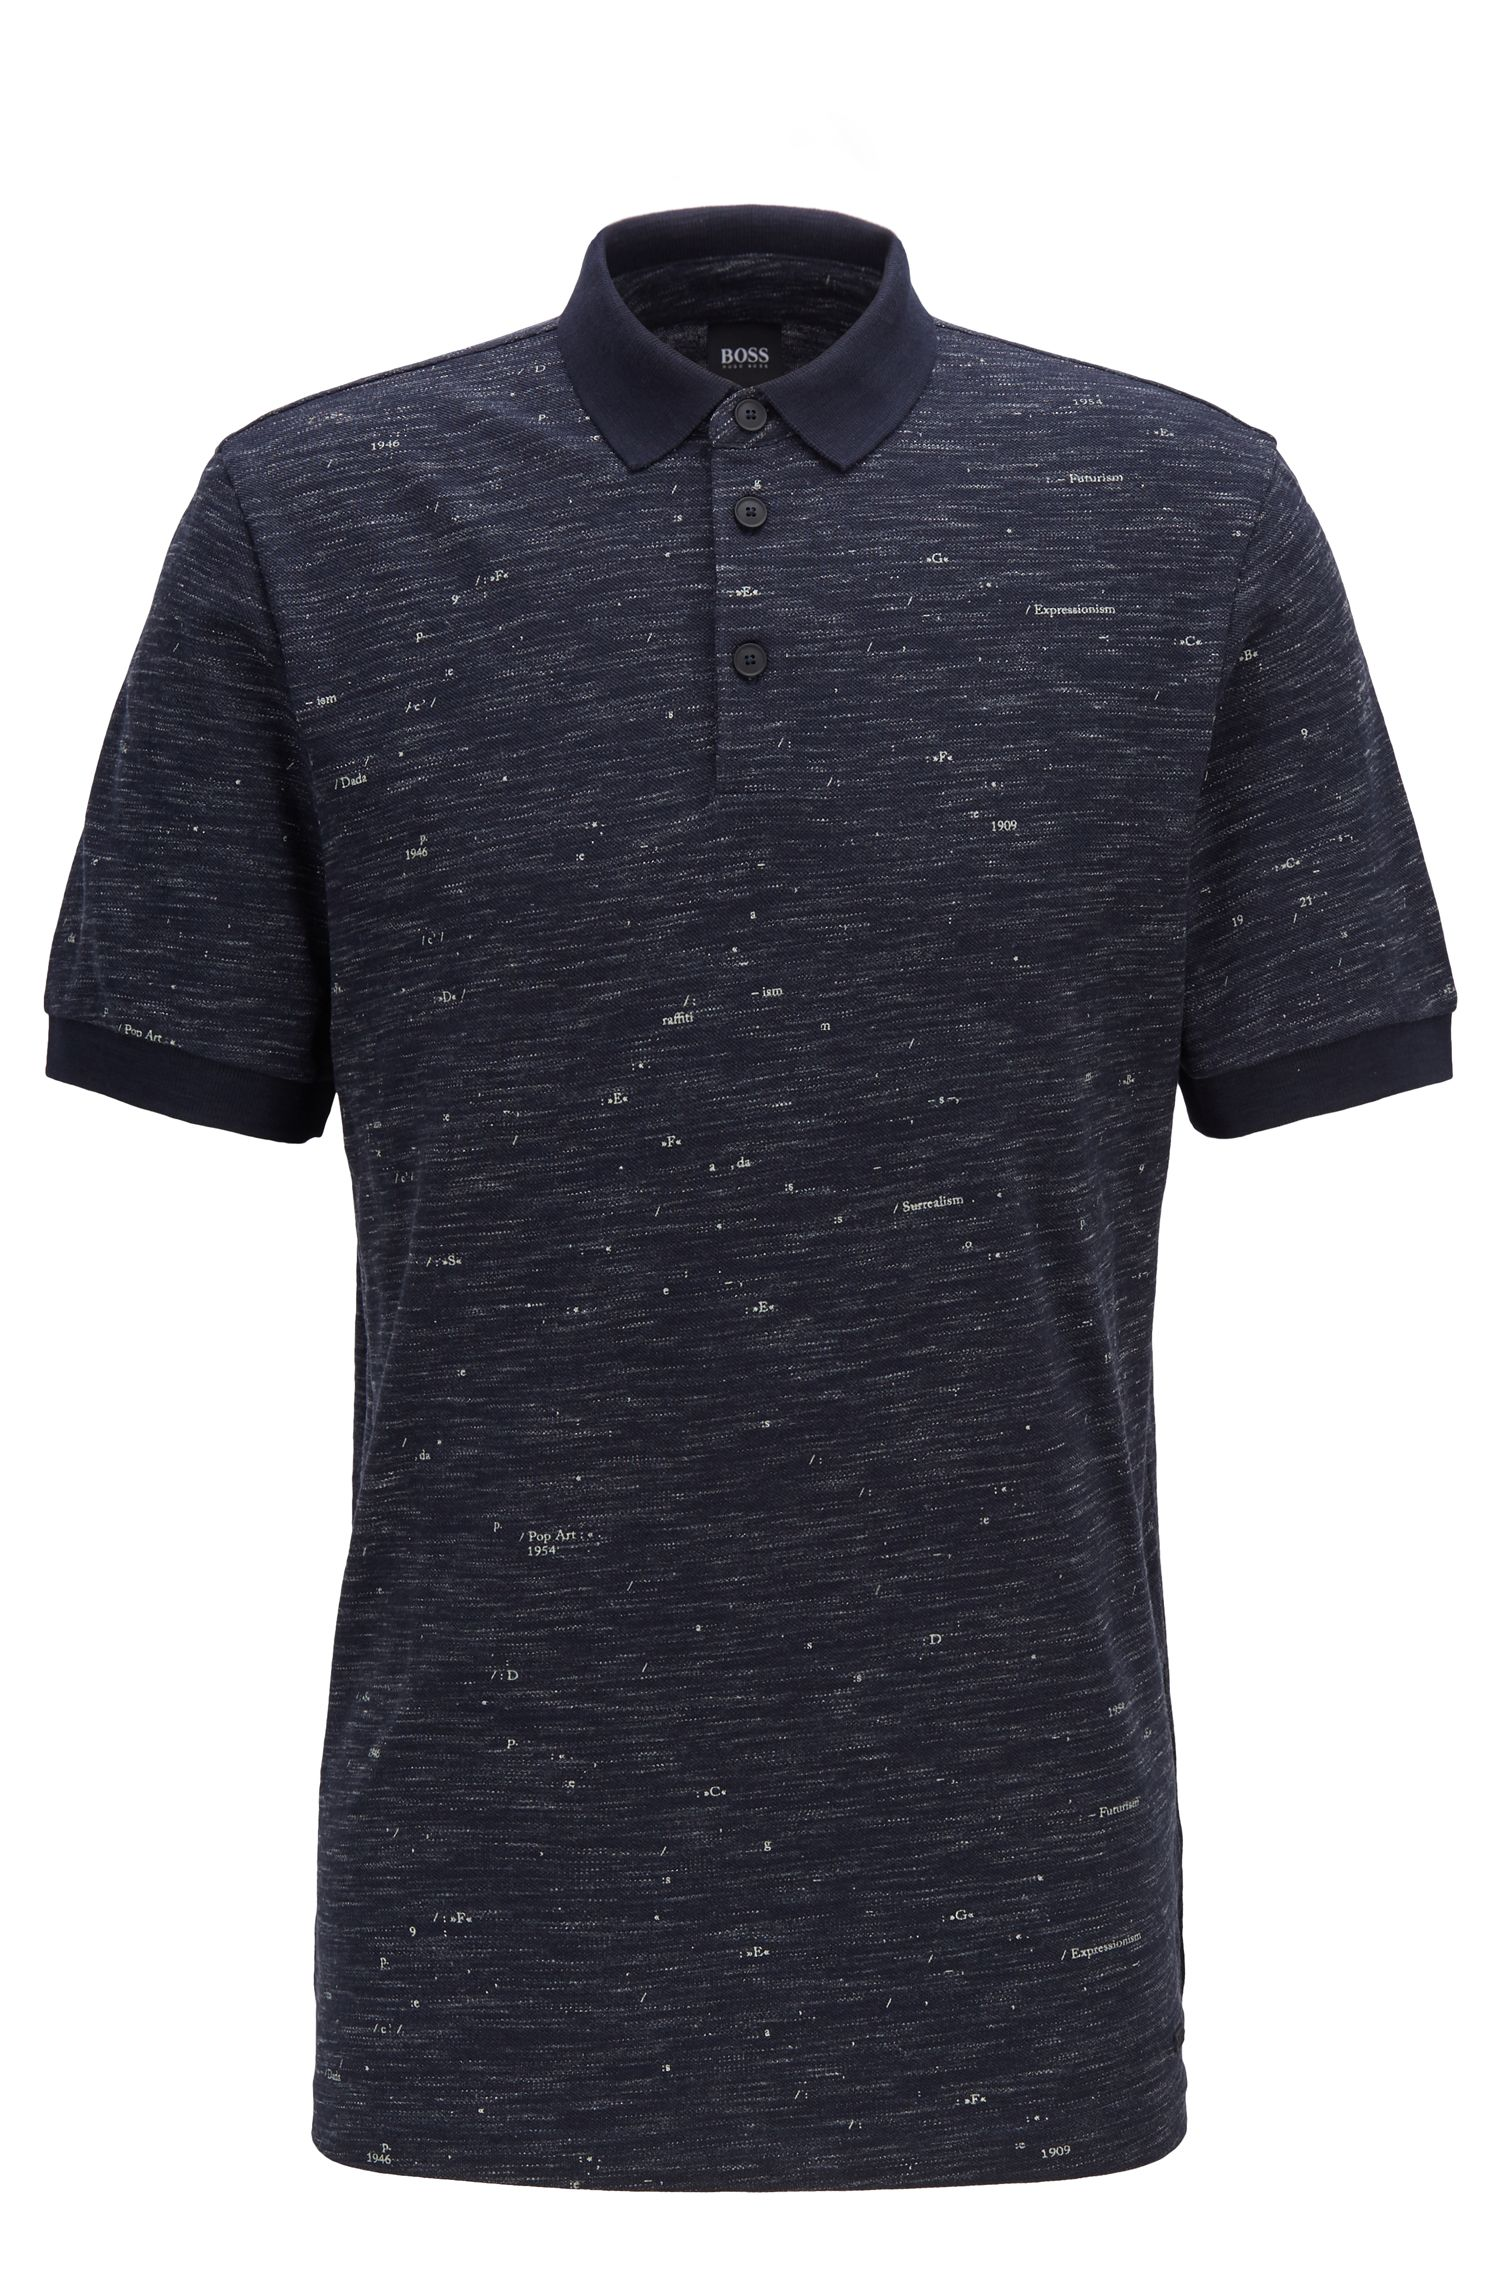 Bedrucktes Poloshirt aus strukturiertem Piqué, Dunkelblau